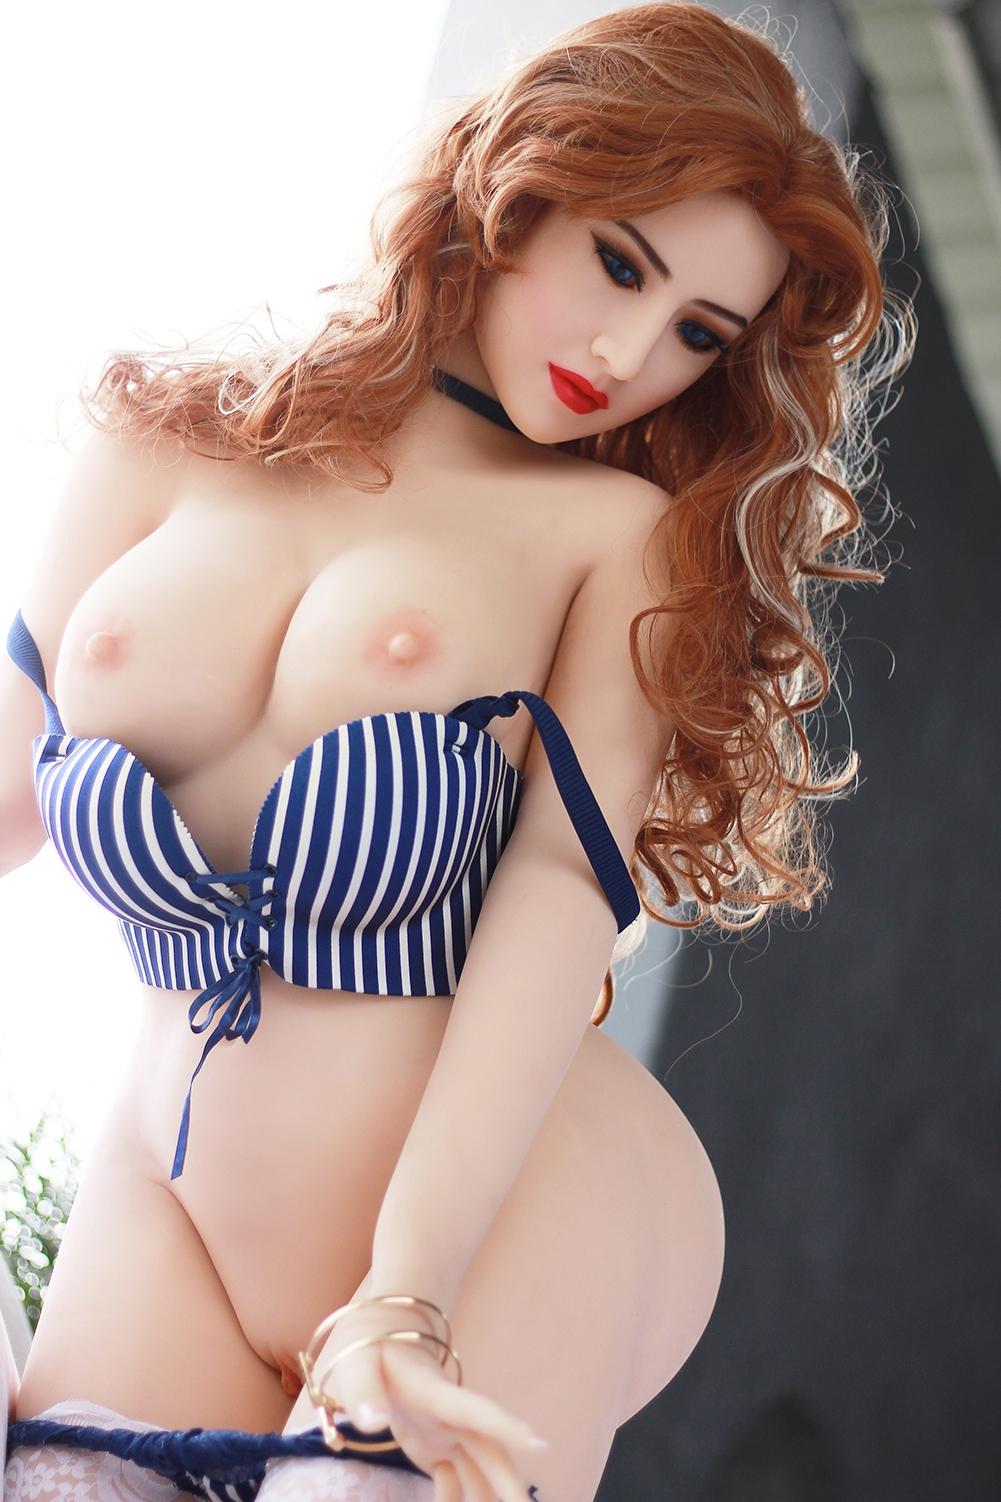 Fat Big Ass Silicone Sex Doll Tpe Realistic Love Dolls -8087